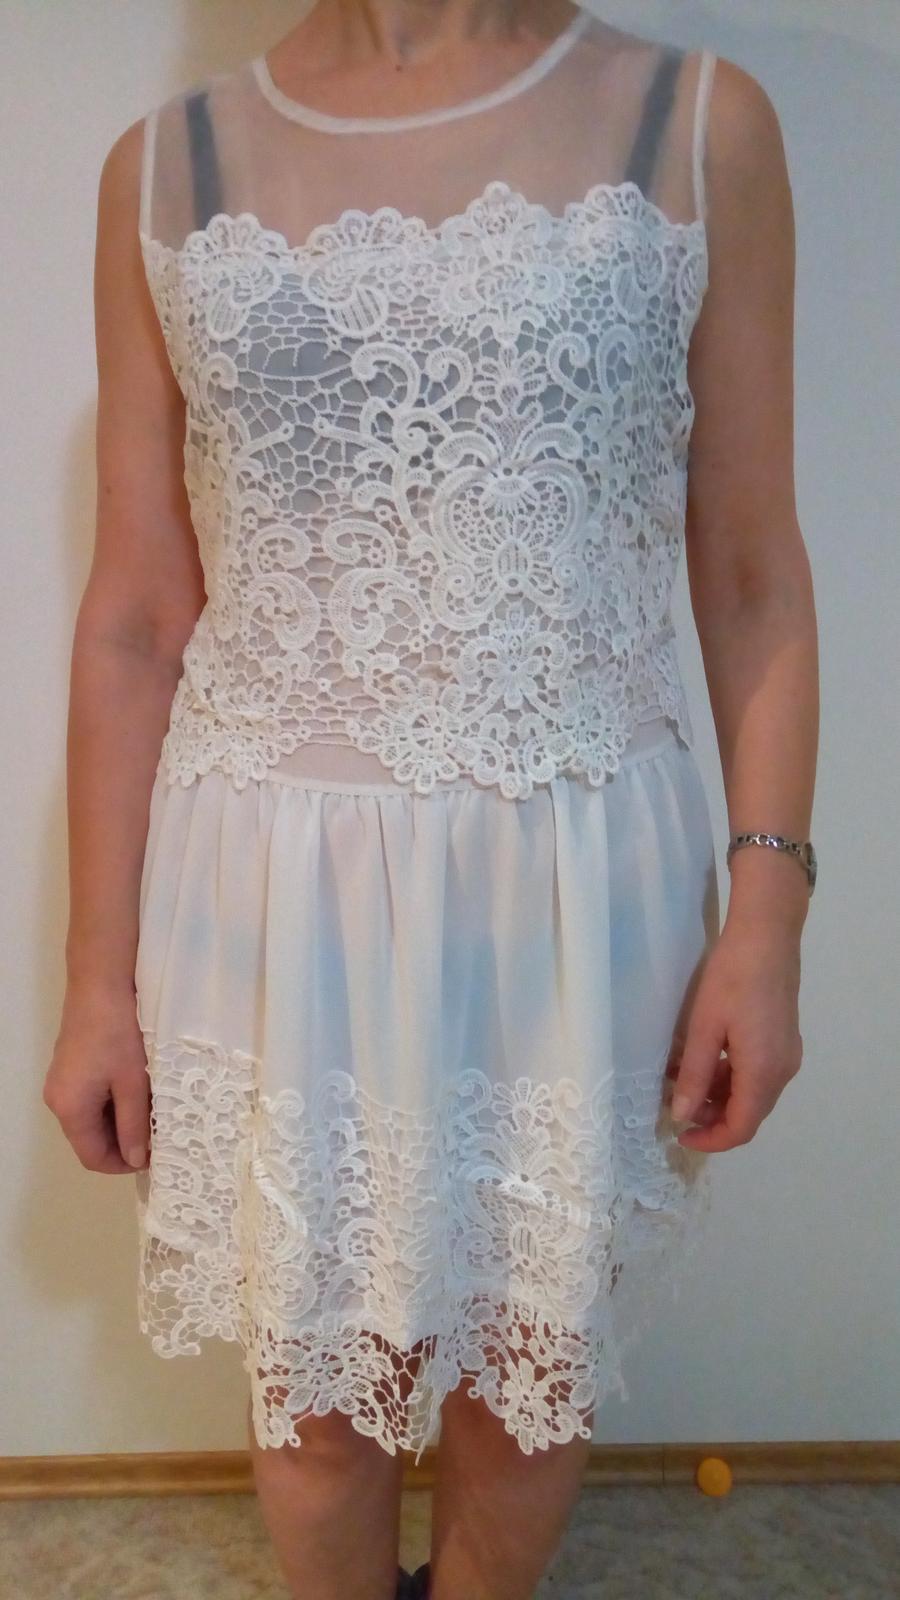 biele šaty M - Obrázok č. 2